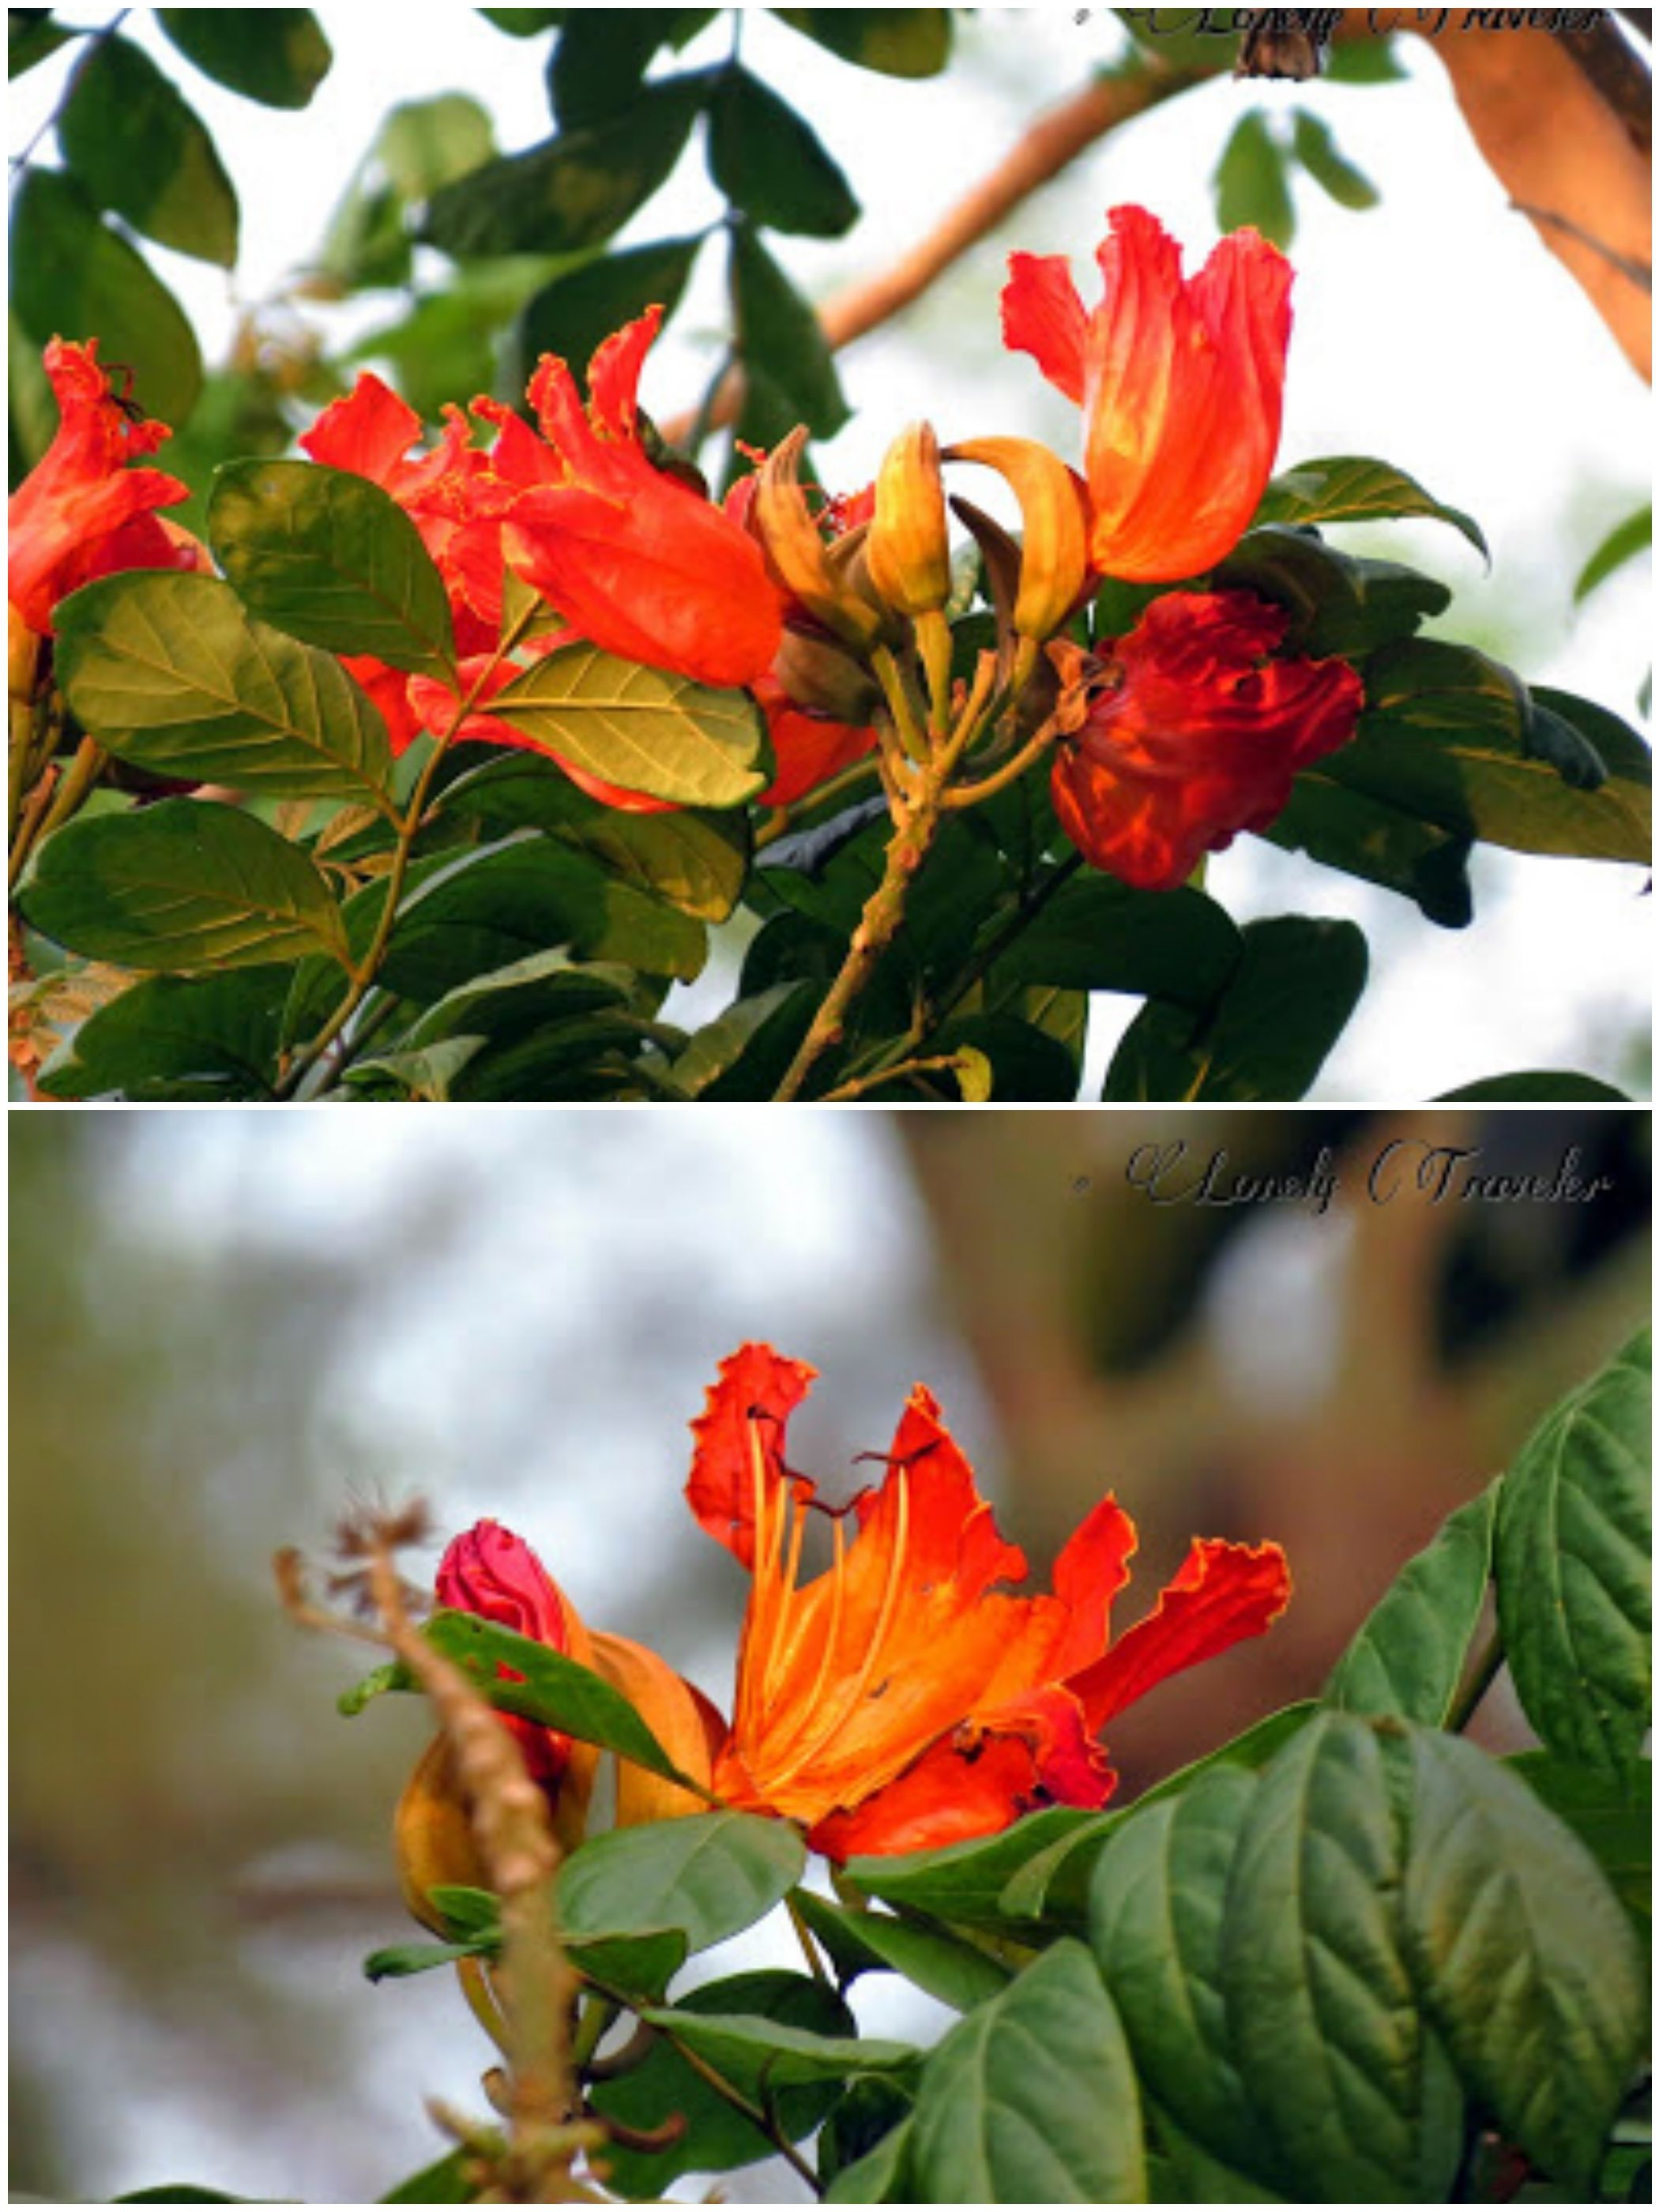 Rudra Palash (রুদ্র পলাশ) - African Tulip - Campanulata ... Palash Flowers Images